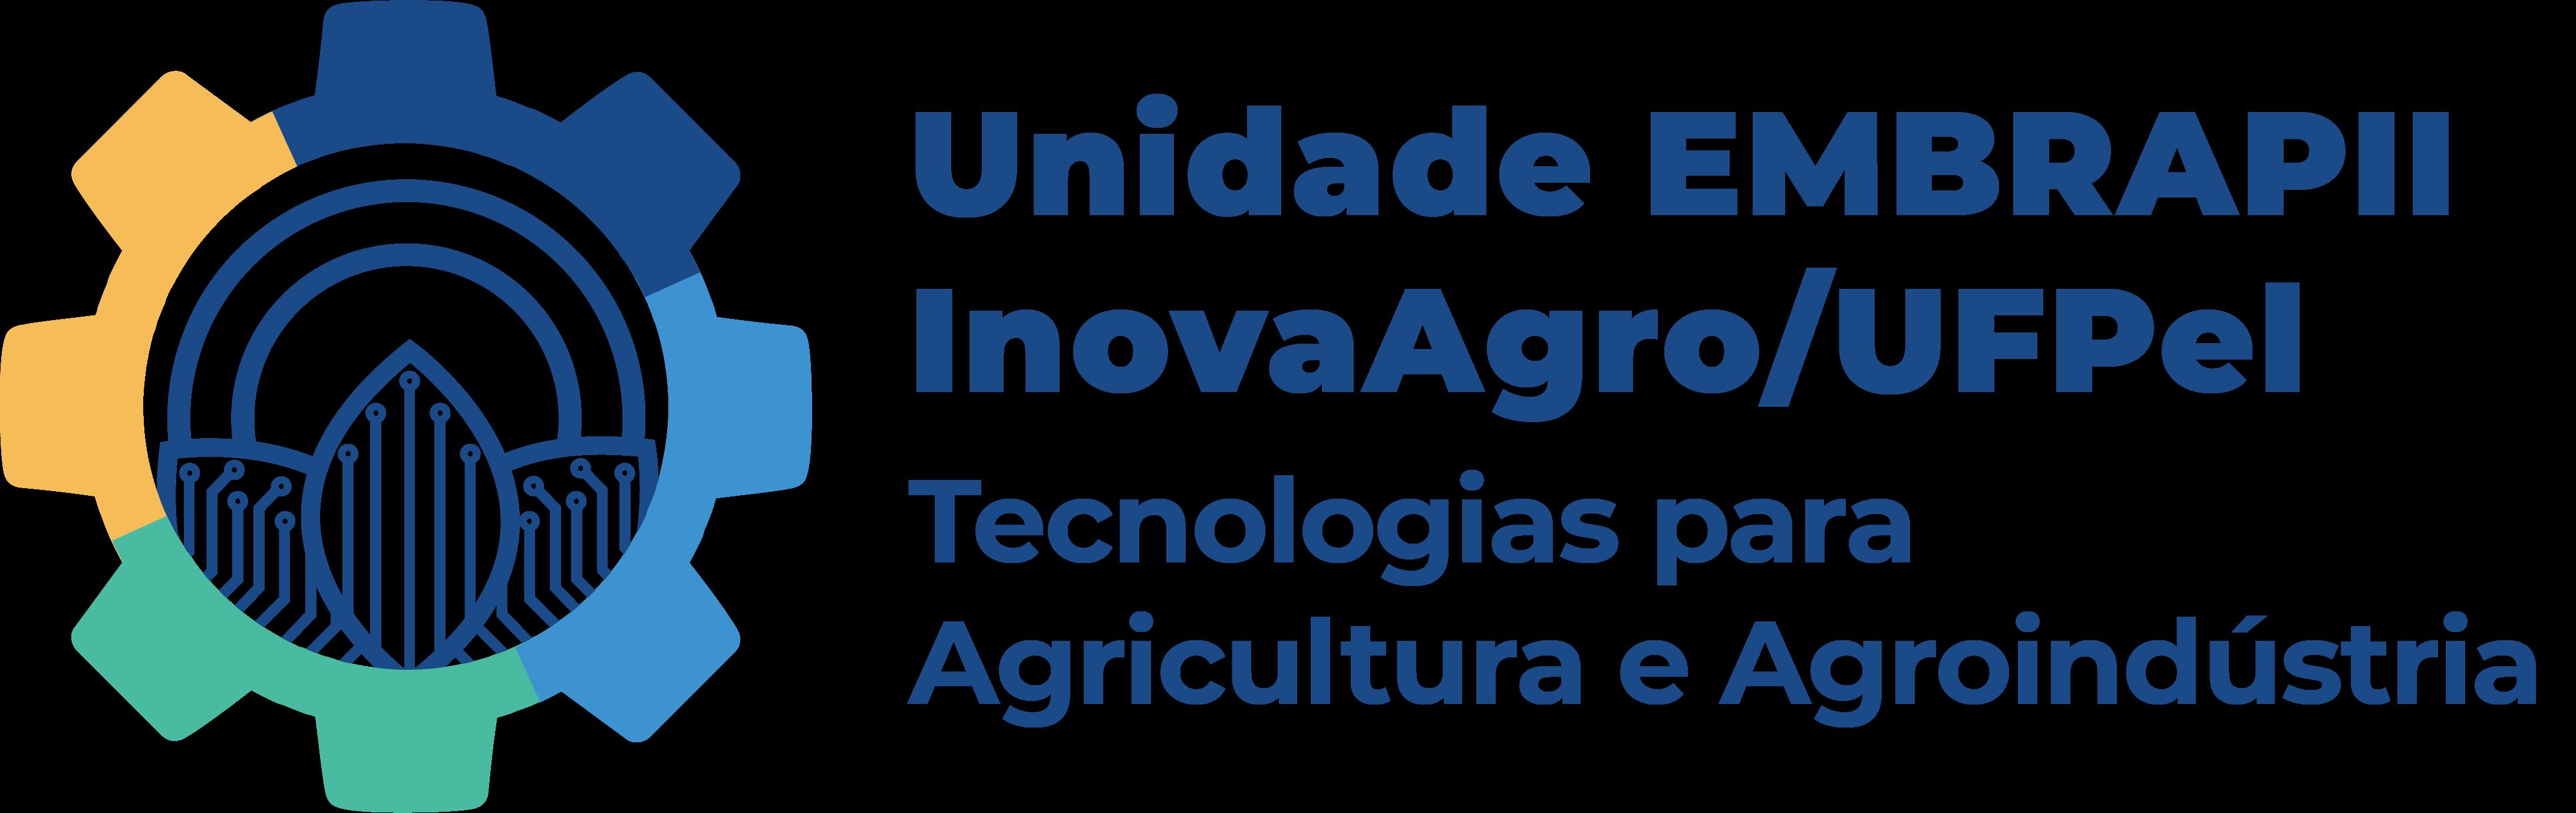 Logo Unidade Embrapii InovaAgro